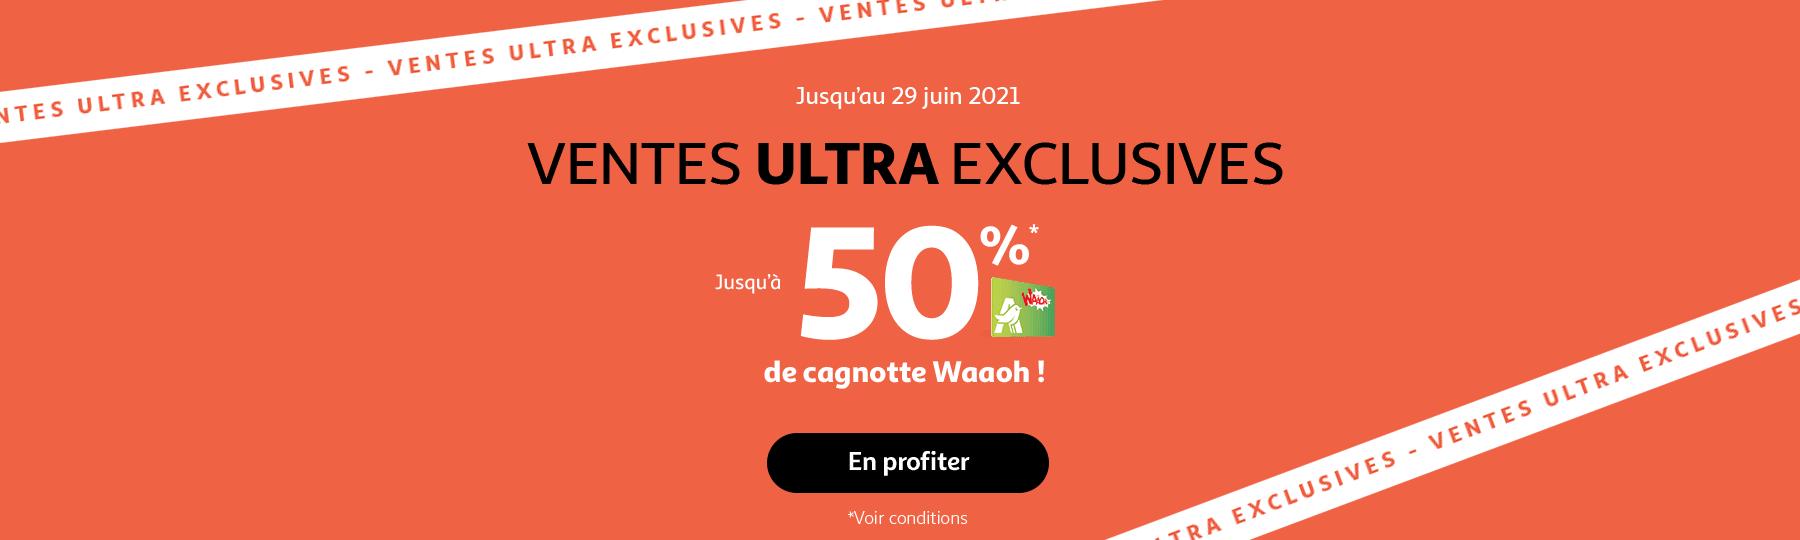 Ventes ultra exlusives, jusqu'à 50 de cagnoette Waaoh ! Jusqu'au 29 Juin 2021